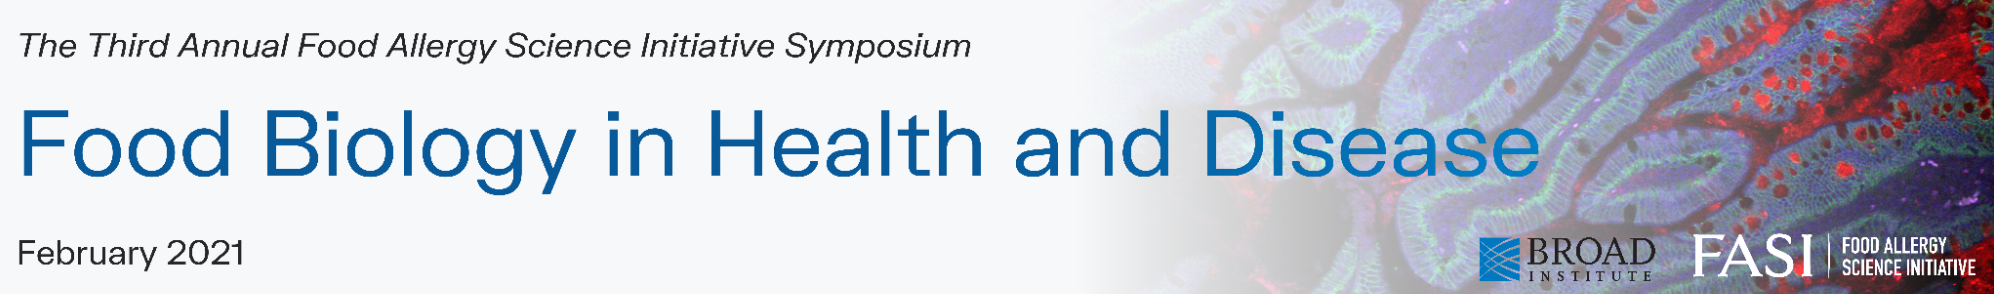 Food Biology in Health and Disease